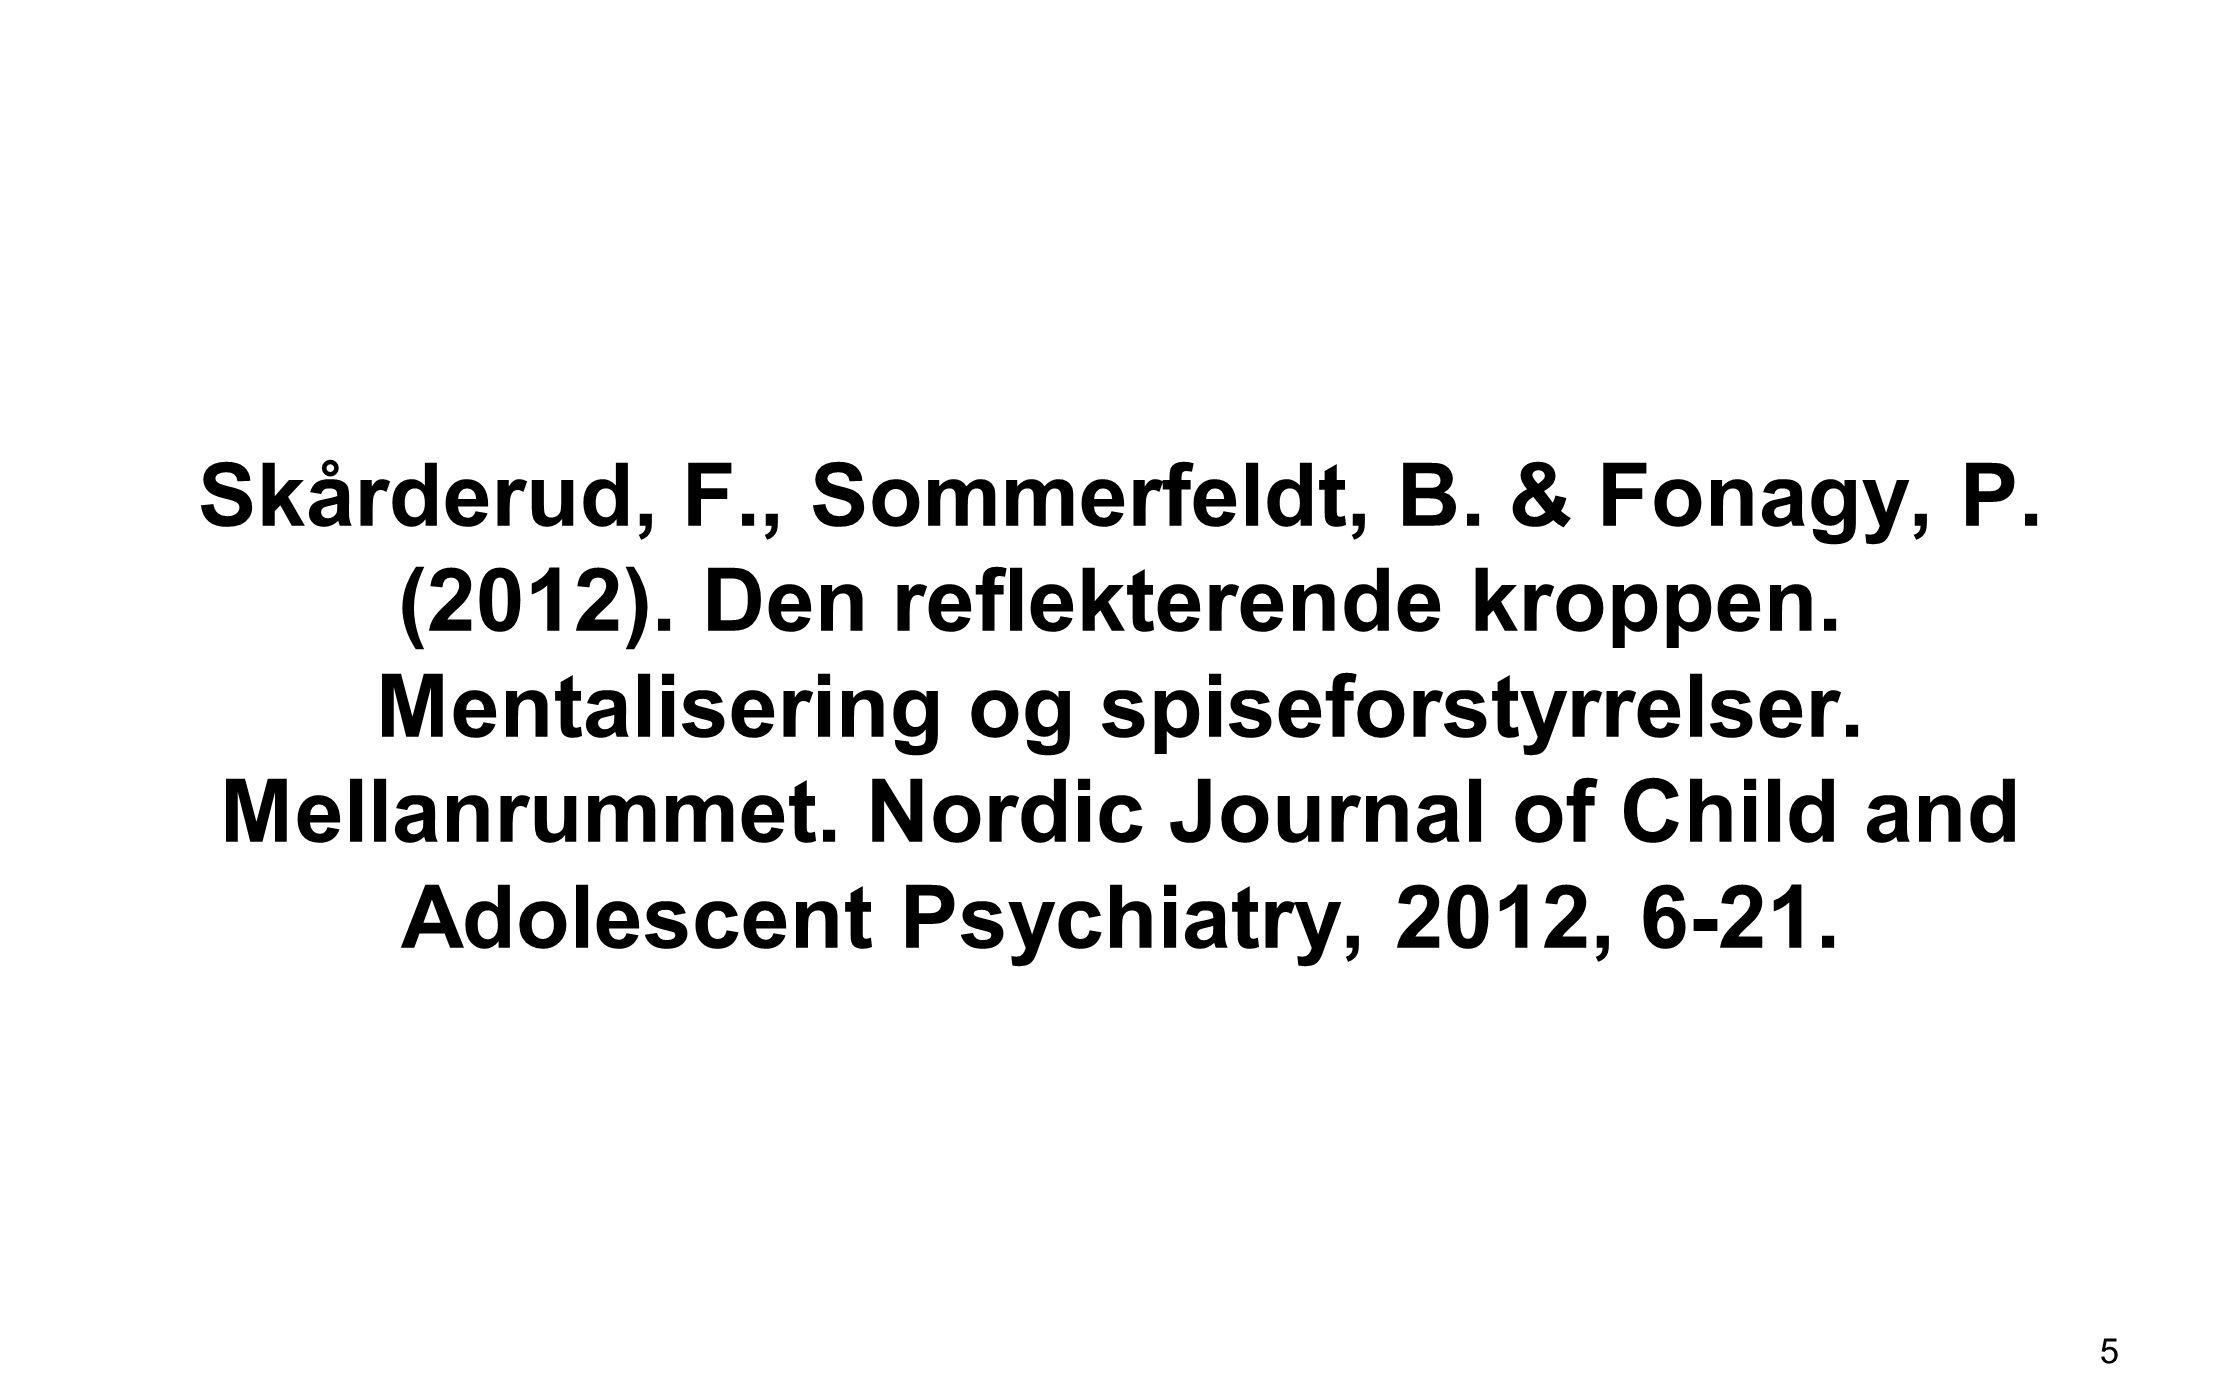 Skårderud, F., Sommerfeldt, B. & Fonagy, P. (2012). Den reflekterende kroppen. Mentalisering og spiseforstyrrelser. Mellanrummet. Nordic Journal of Ch